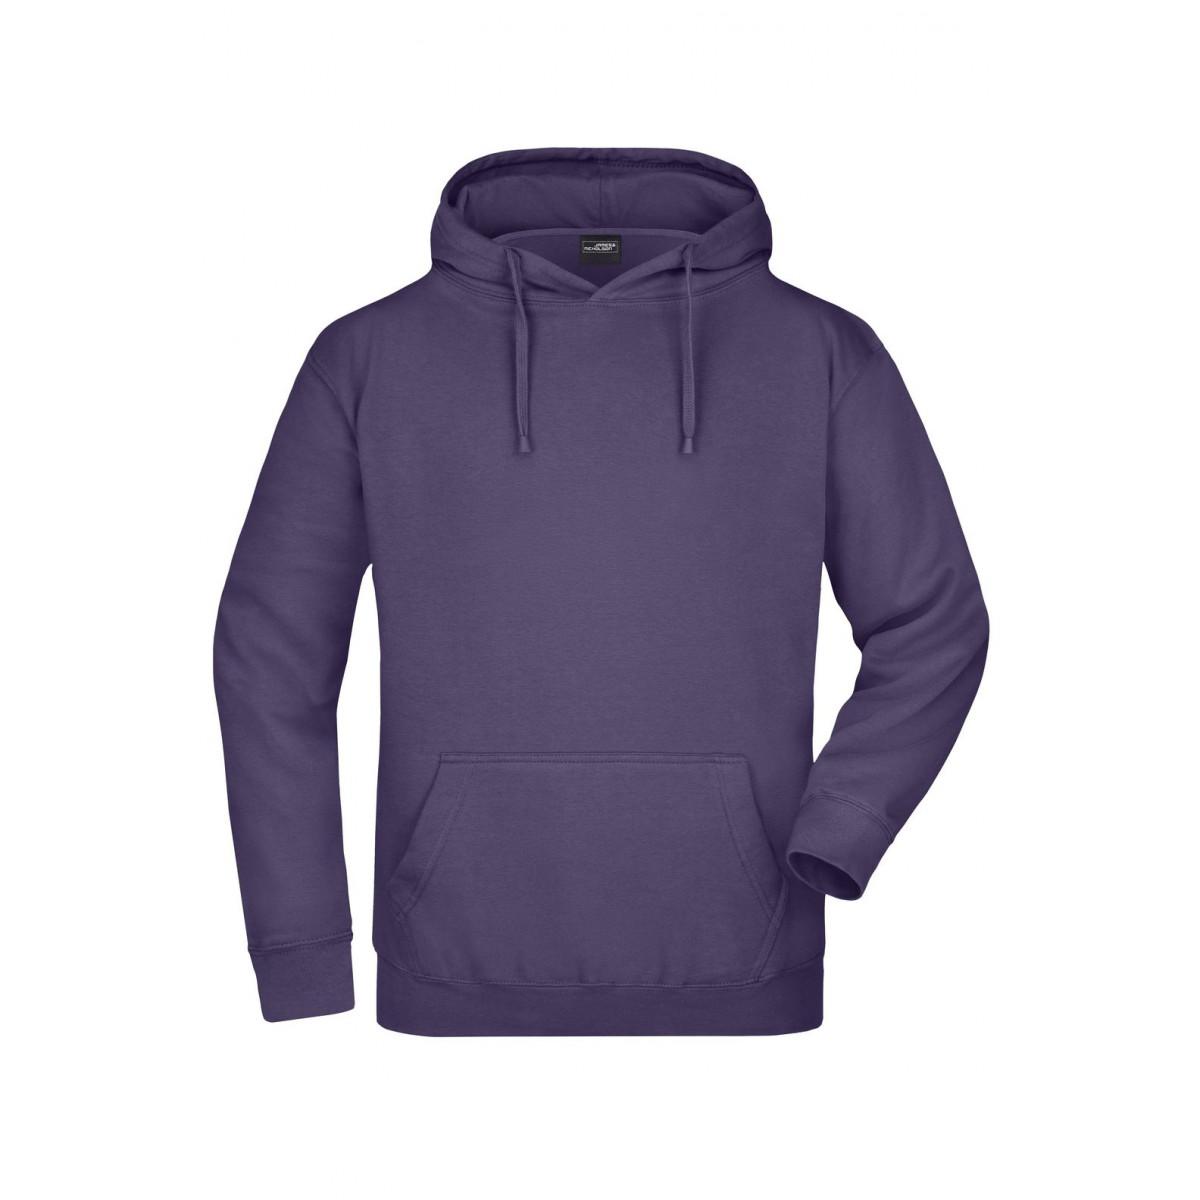 Толстовка мужская JN047 Hooded Sweat - Темно-фиолетовый